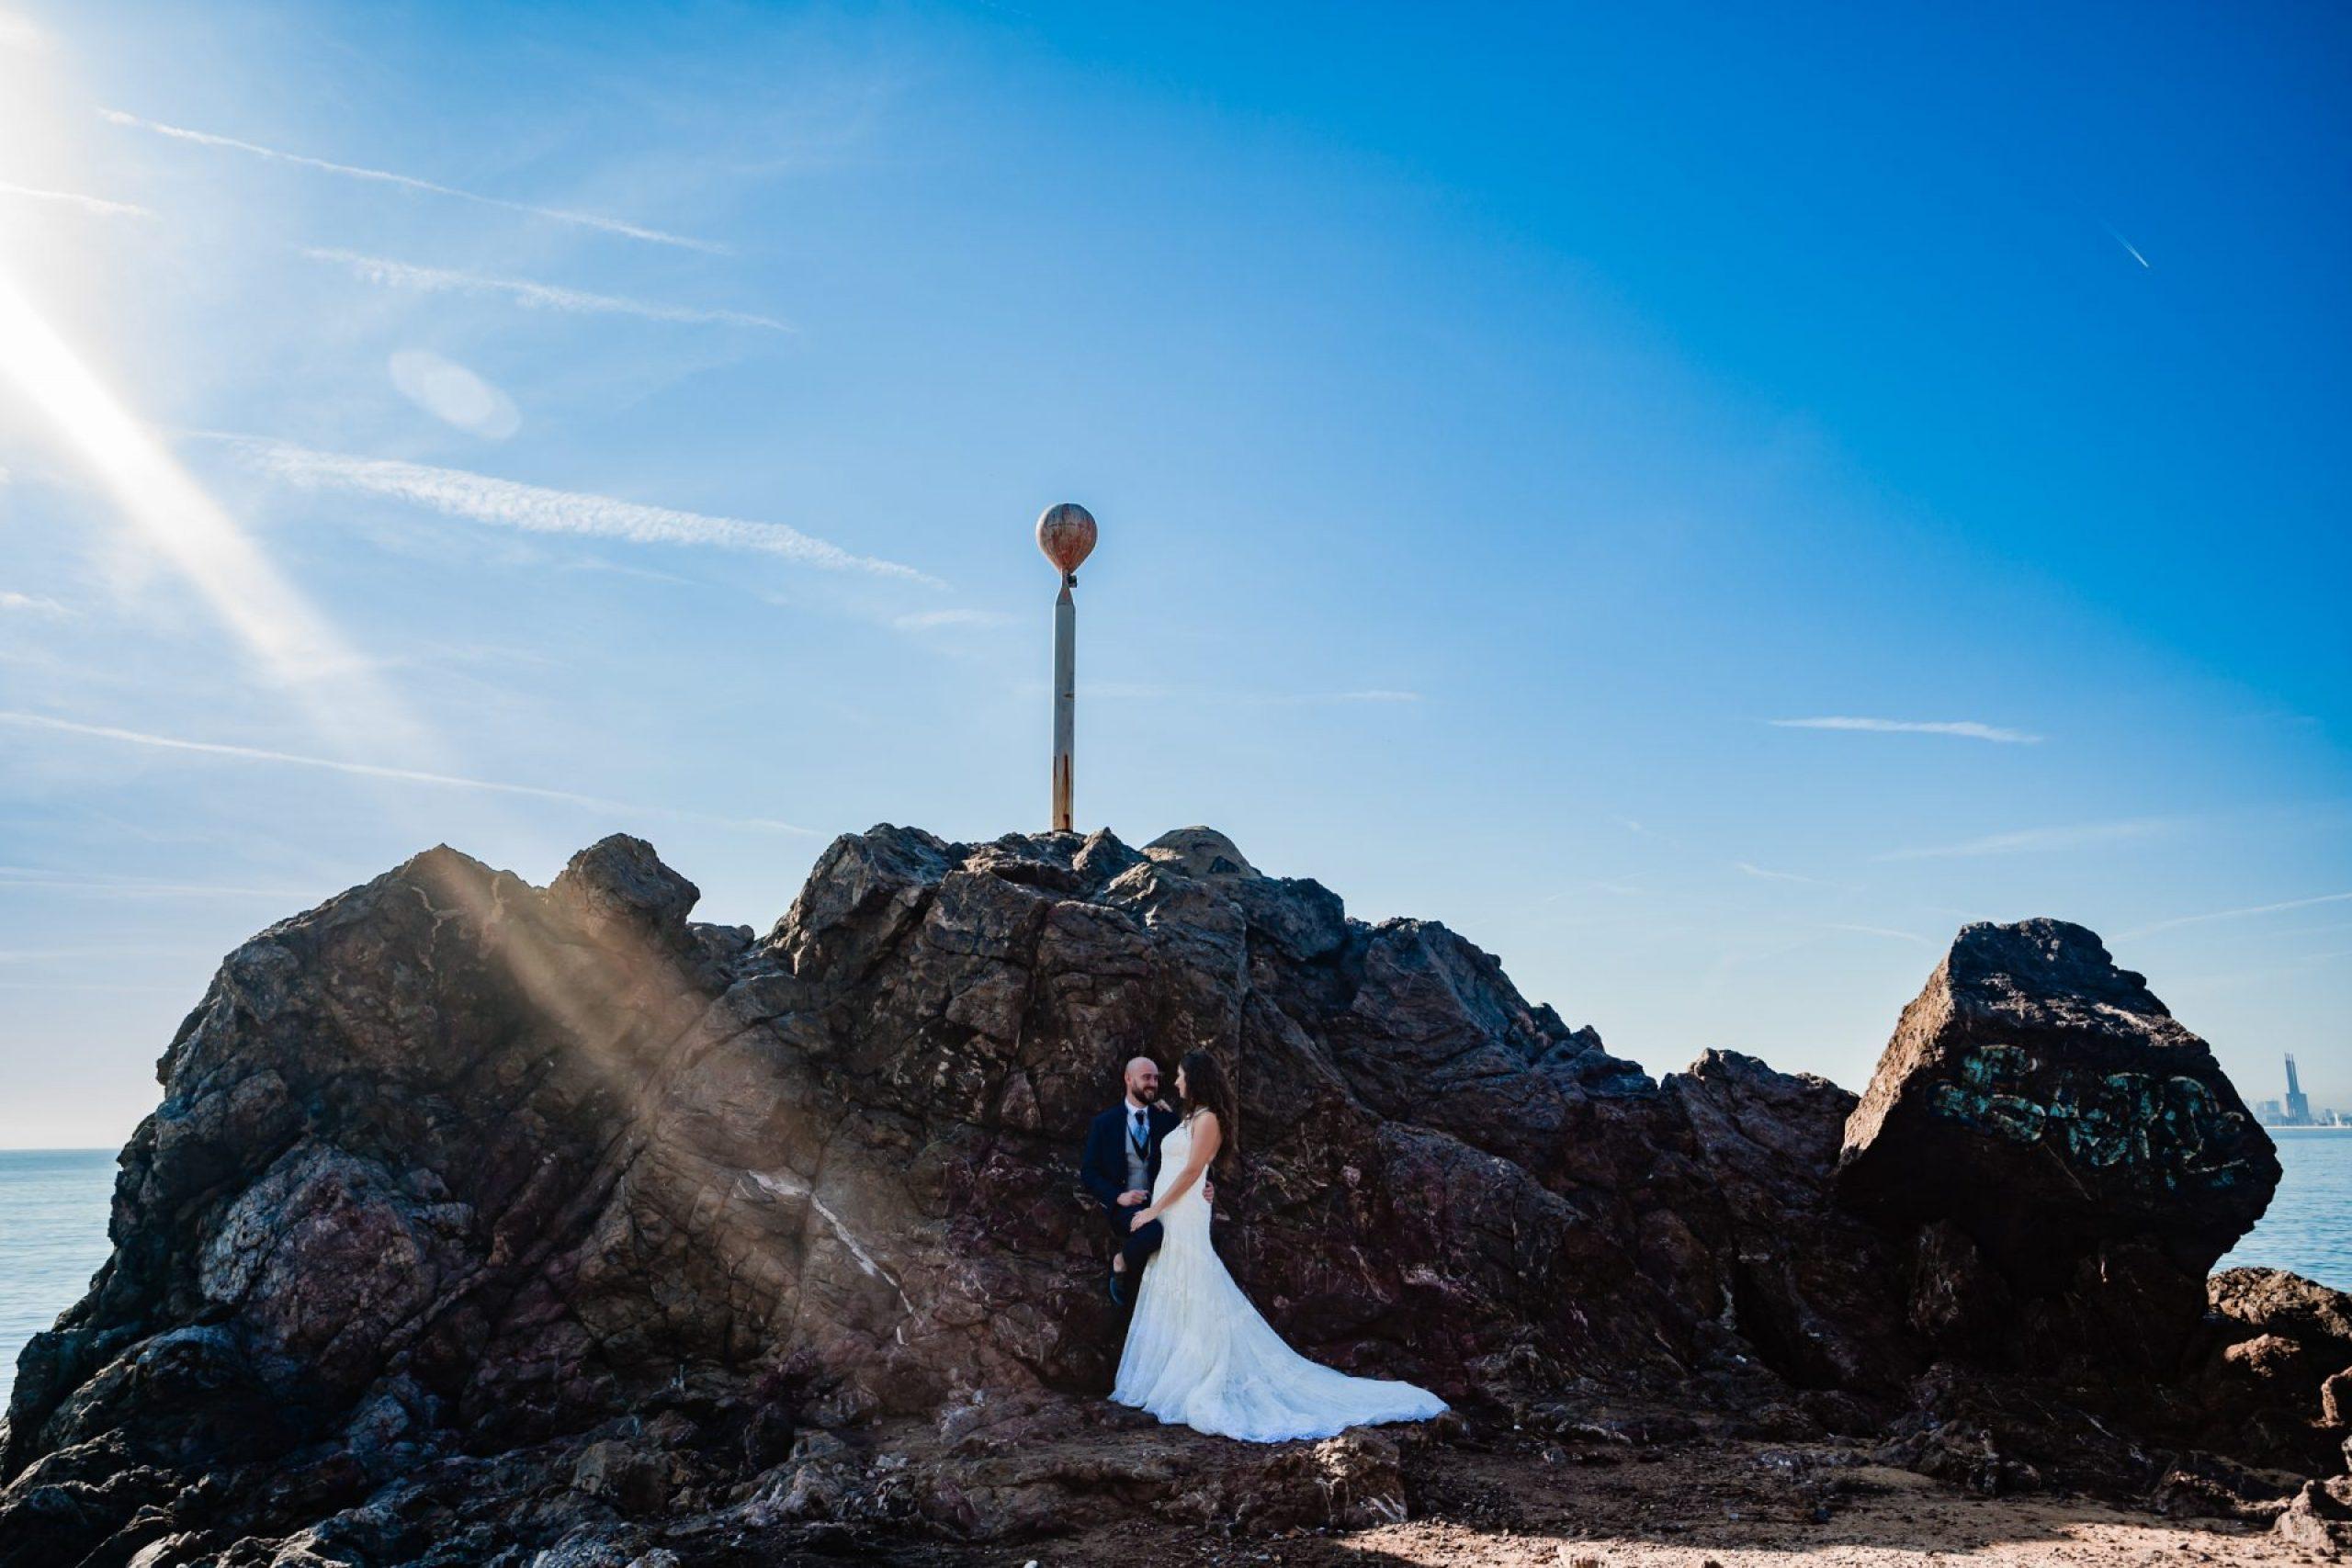 LuzdeBarcelona-postboda-playa-boda-fotografo-cerdanyola-22